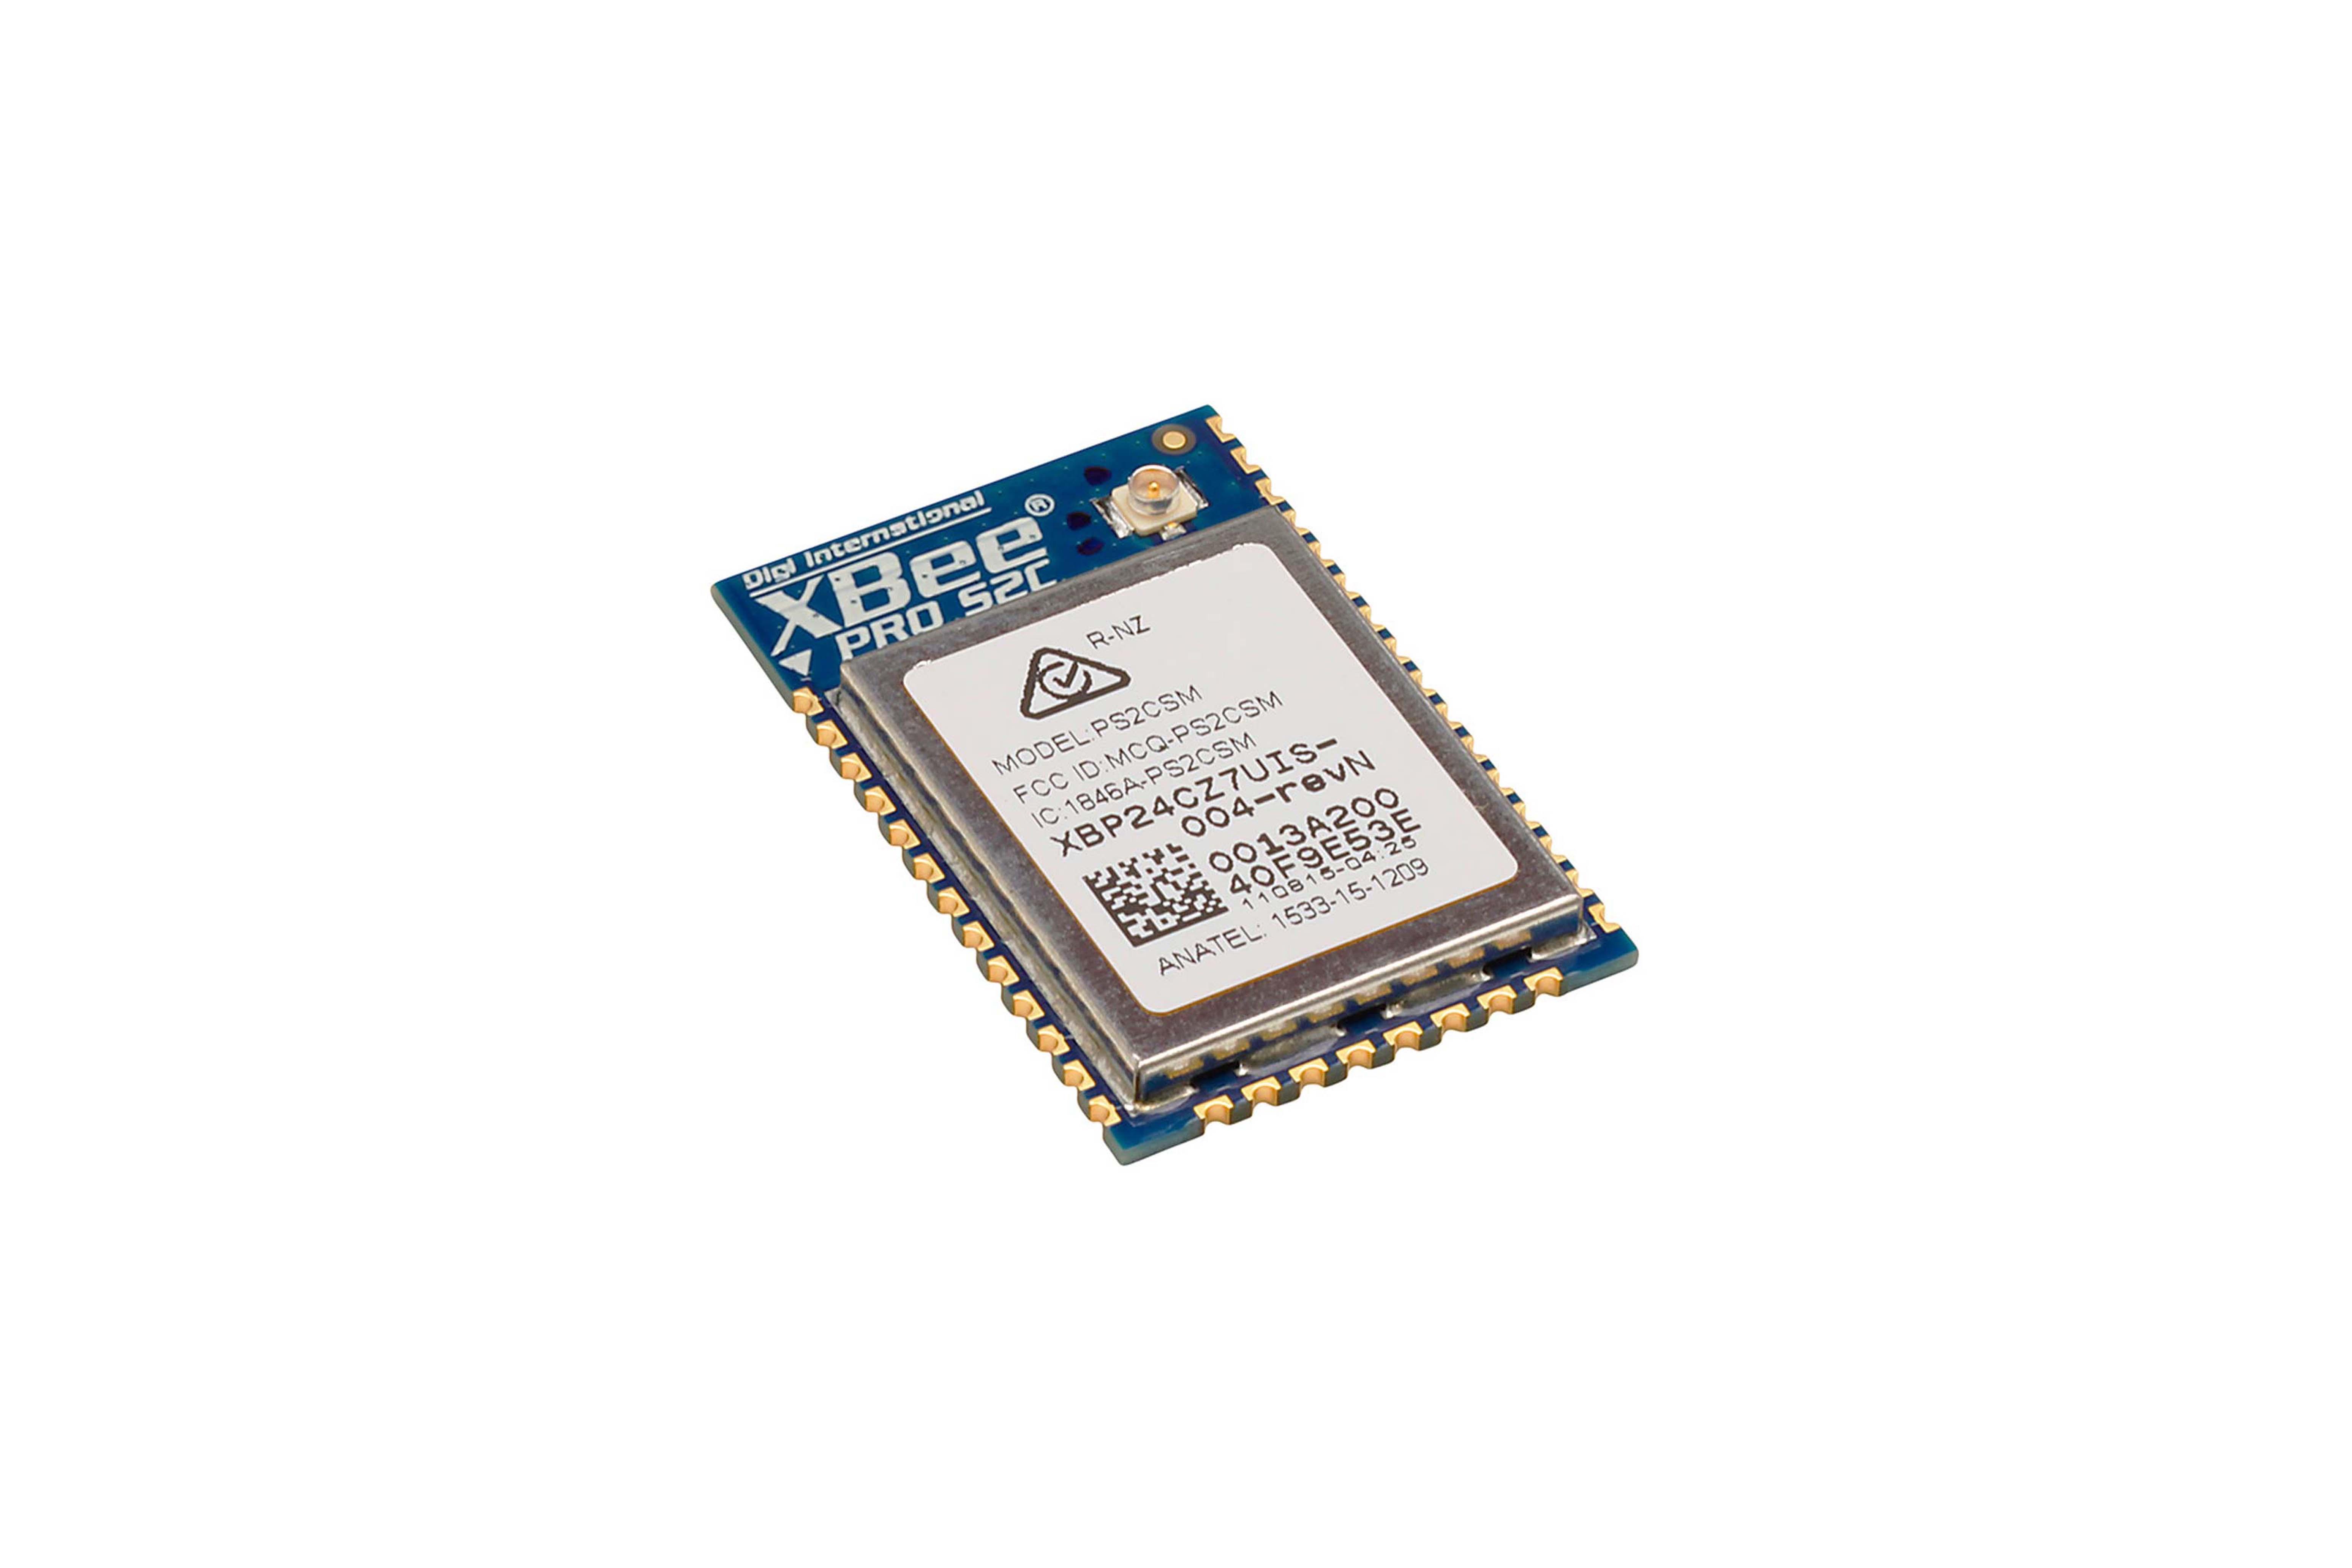 XBee-PRO(ジグビー・プロ) ZB SMT(ZigBee PROセット)、63mW